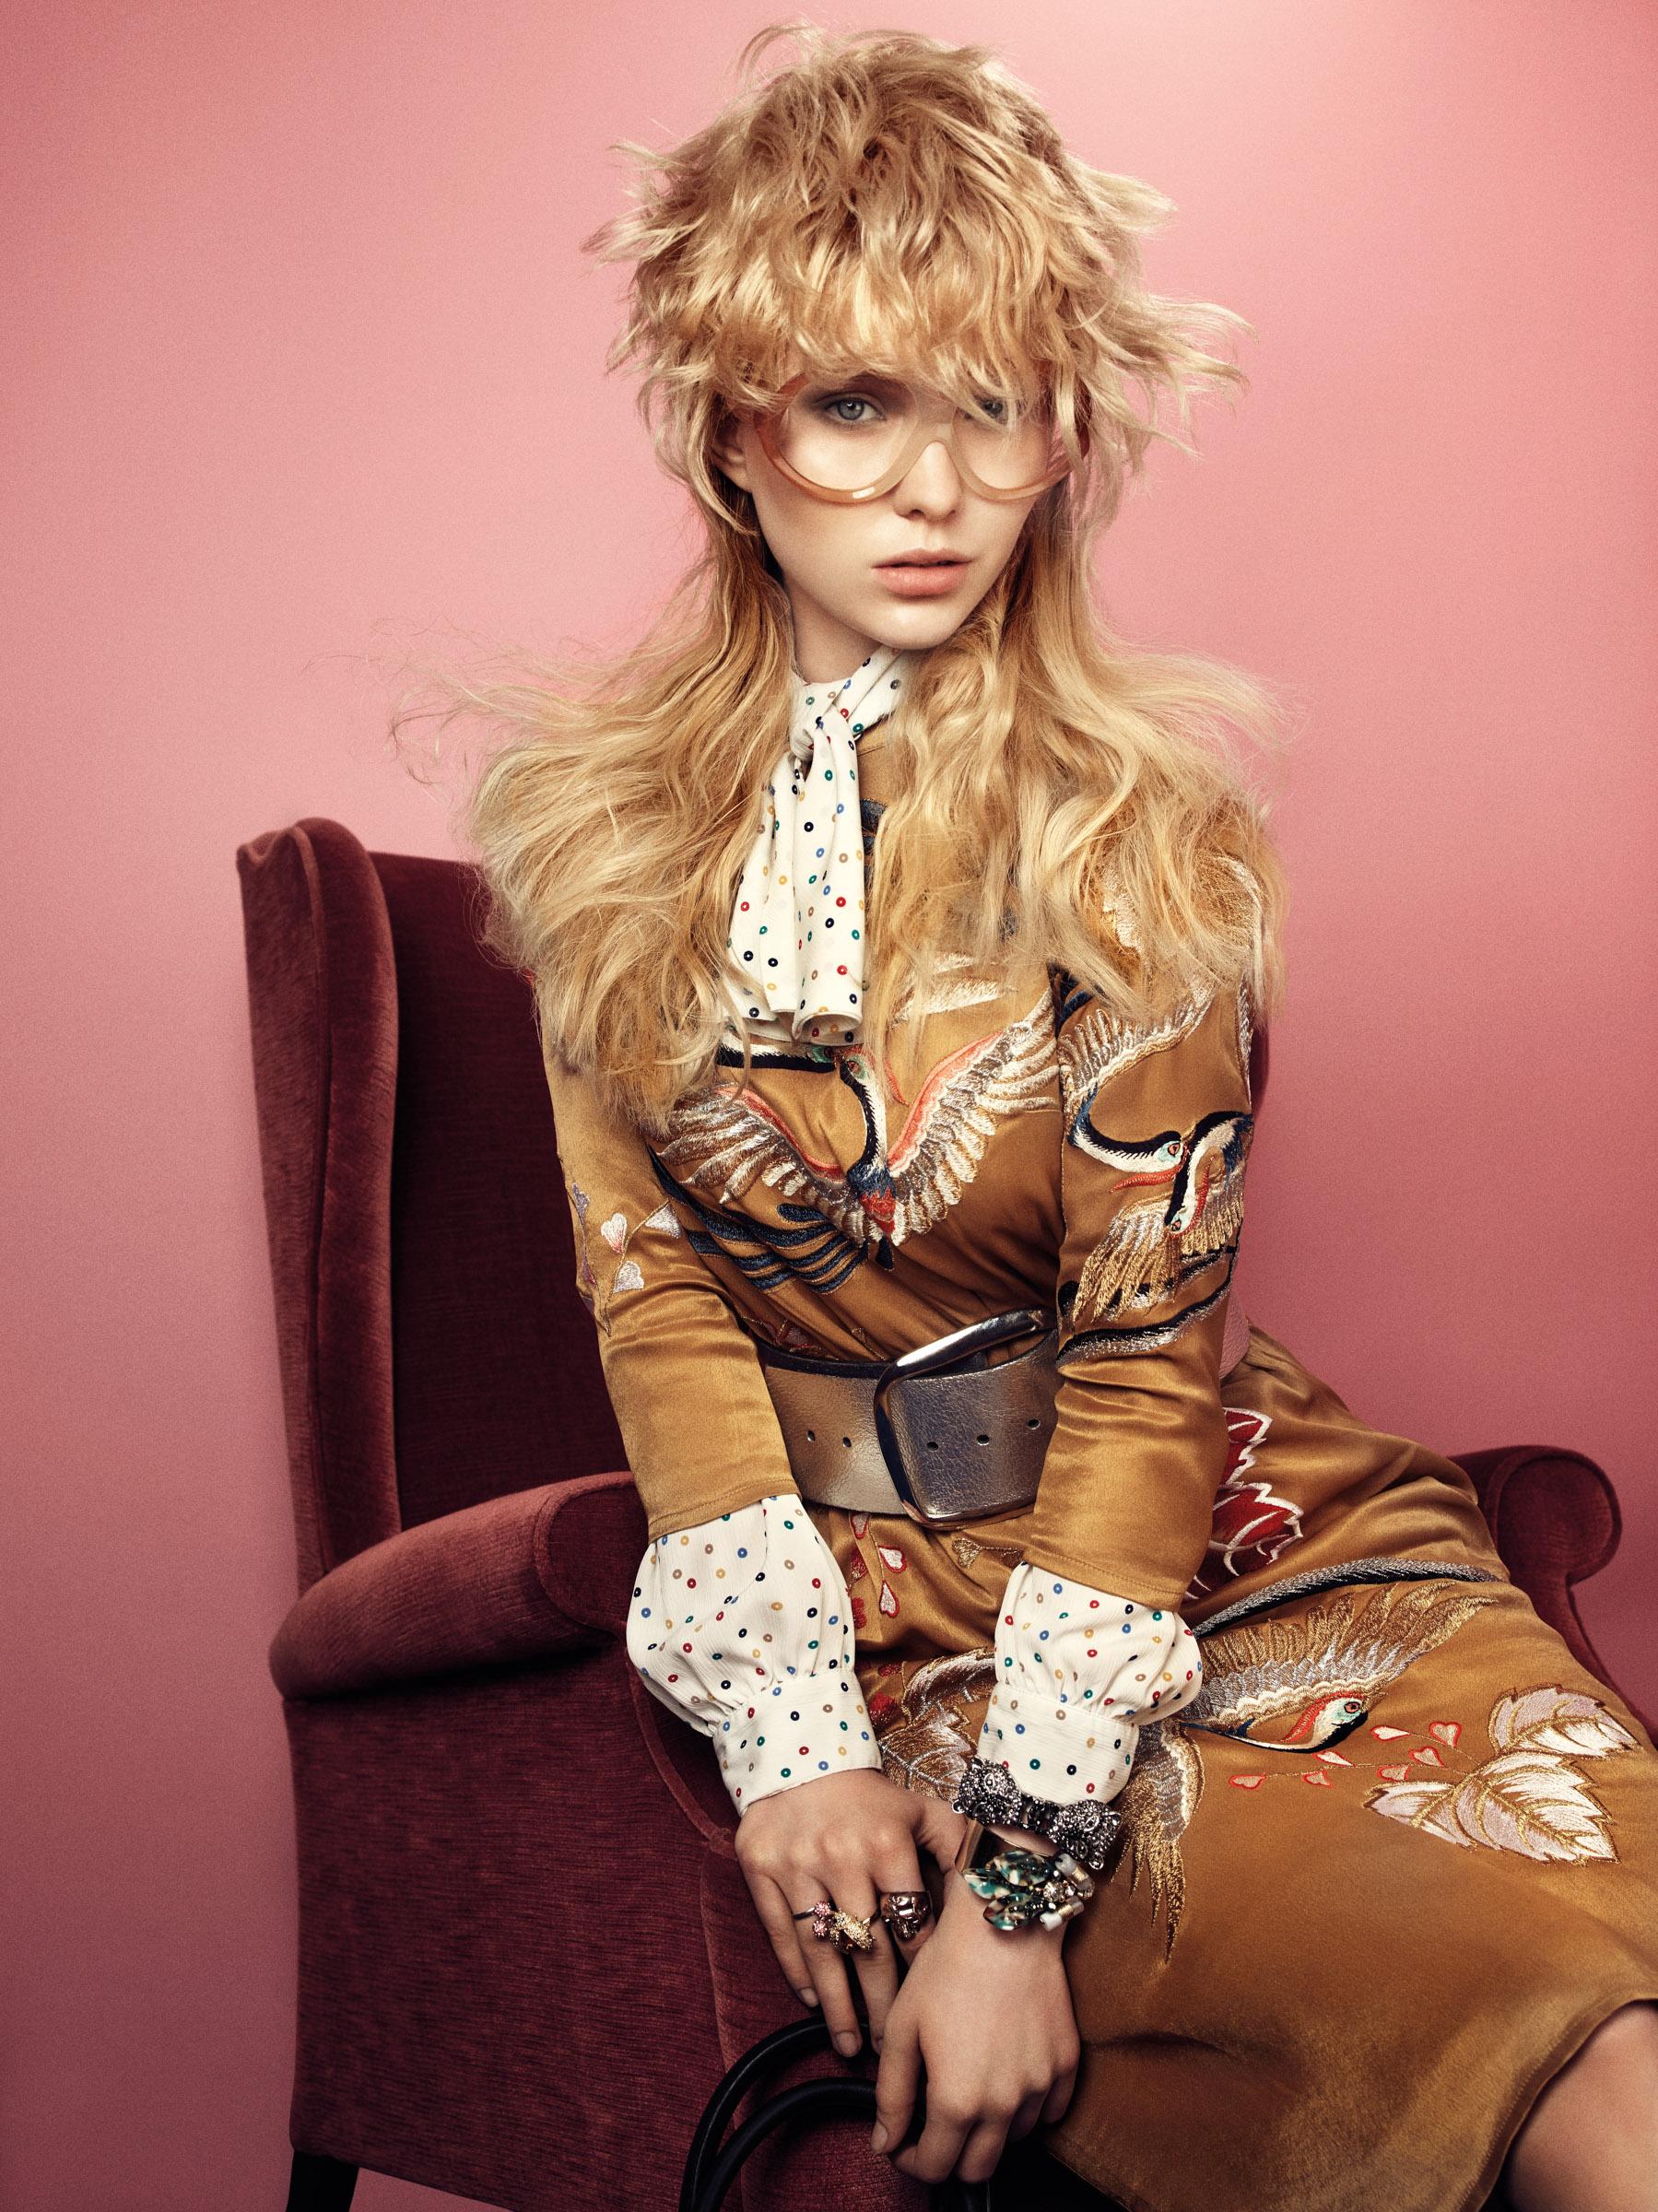 Jack-Eames-Toni-Guy-Hair-Beauty-Photography-Campaign-Pink-Fashion-01.jpg